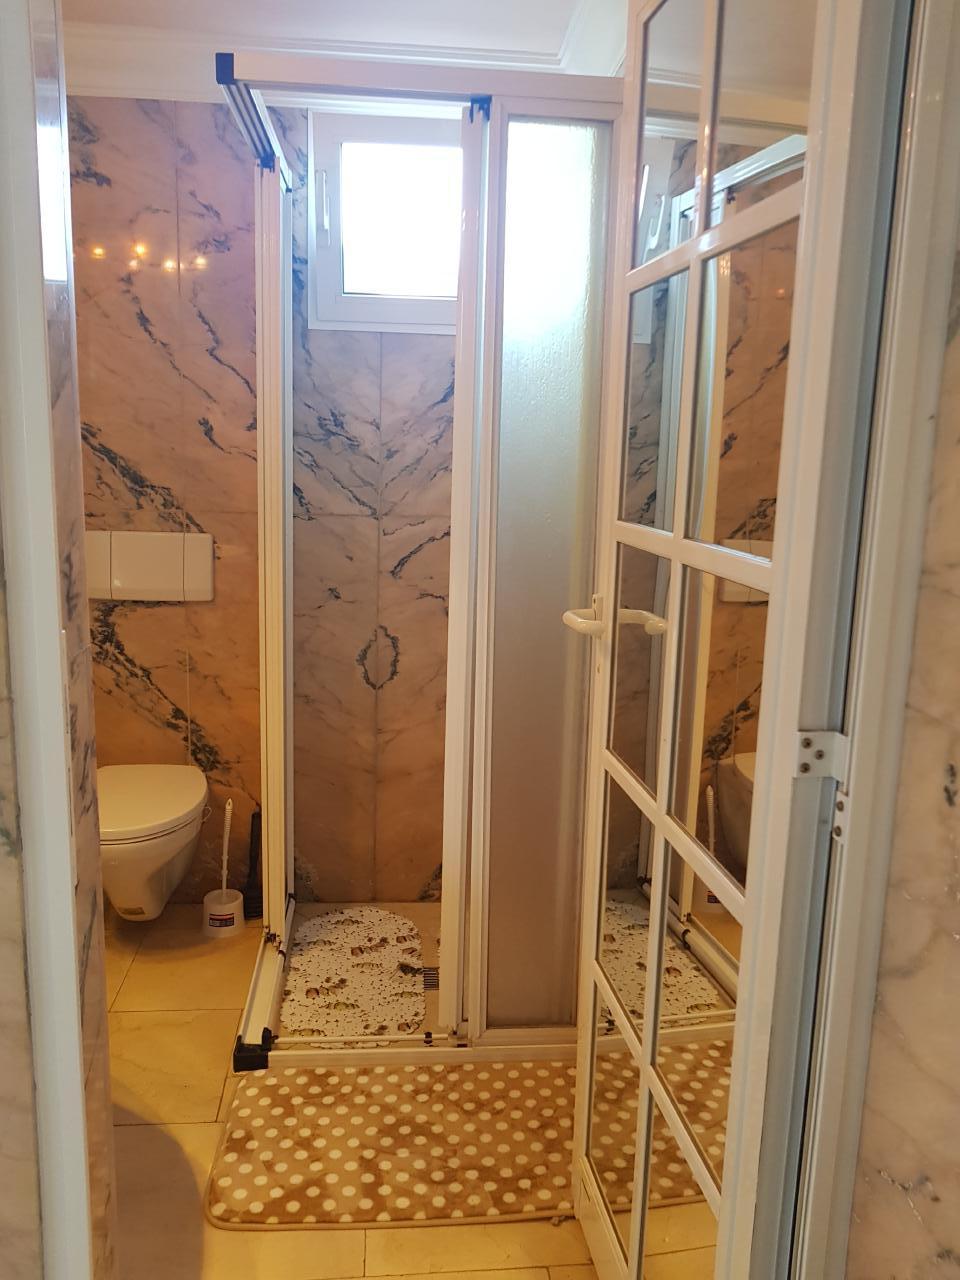 Appartement de vacances Villa Larnia Familien Apartment   * Urlaub für Körper, Geist und Seele * (2529406), El Sauzal, Ténérife, Iles Canaries, Espagne, image 13